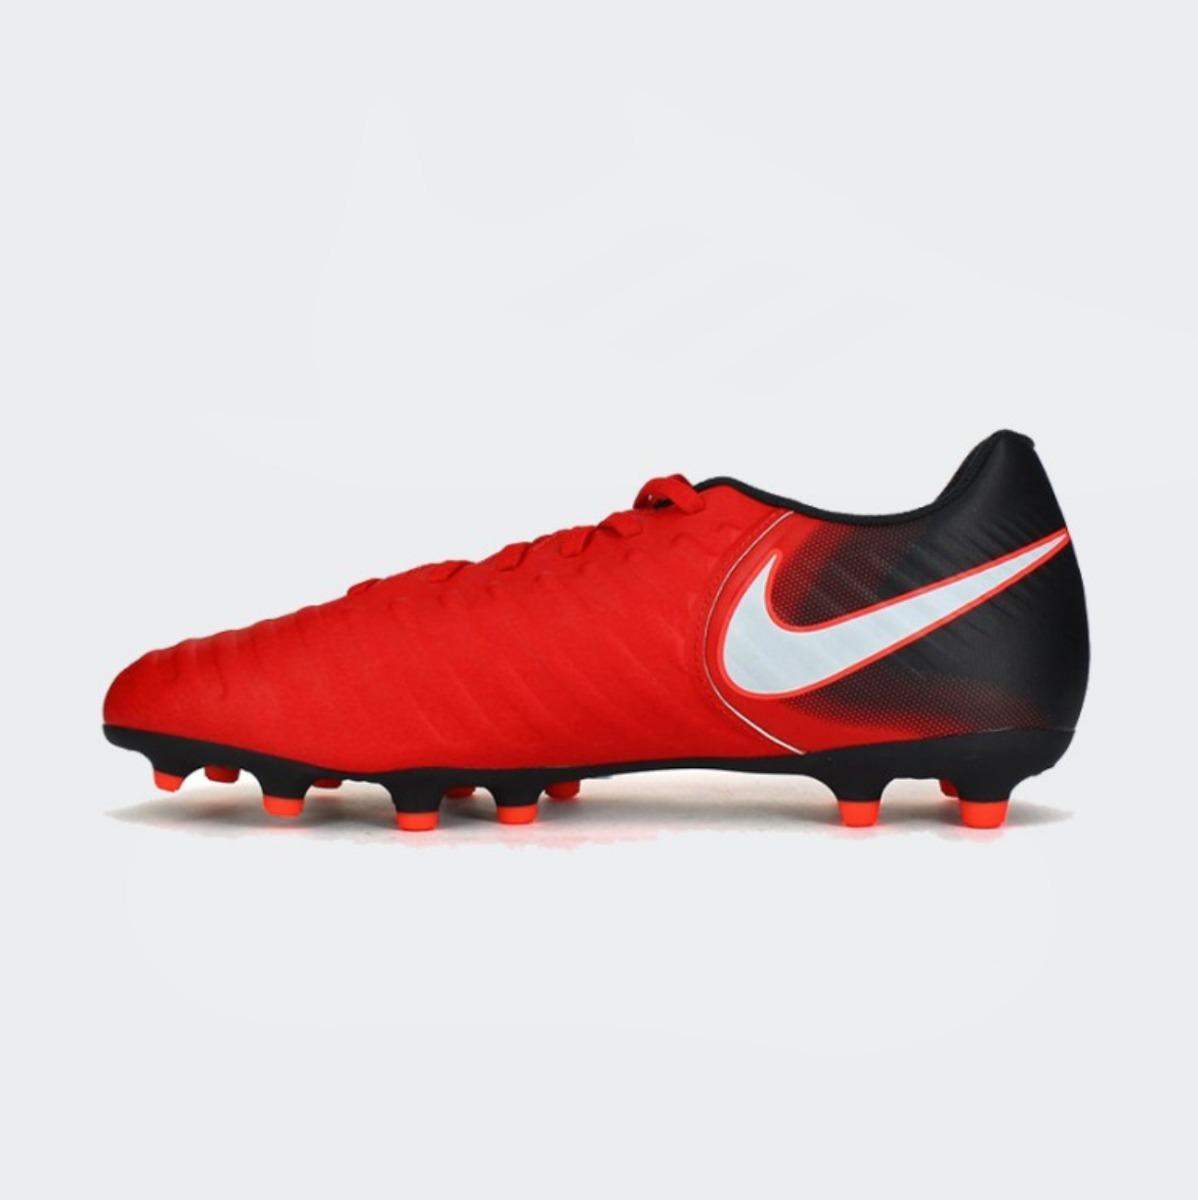 5df60a7fdf763 Zapatos Futbol Nike Tiempo Rio Iv Fg Talla 41 -   36.000 en Mercado ...